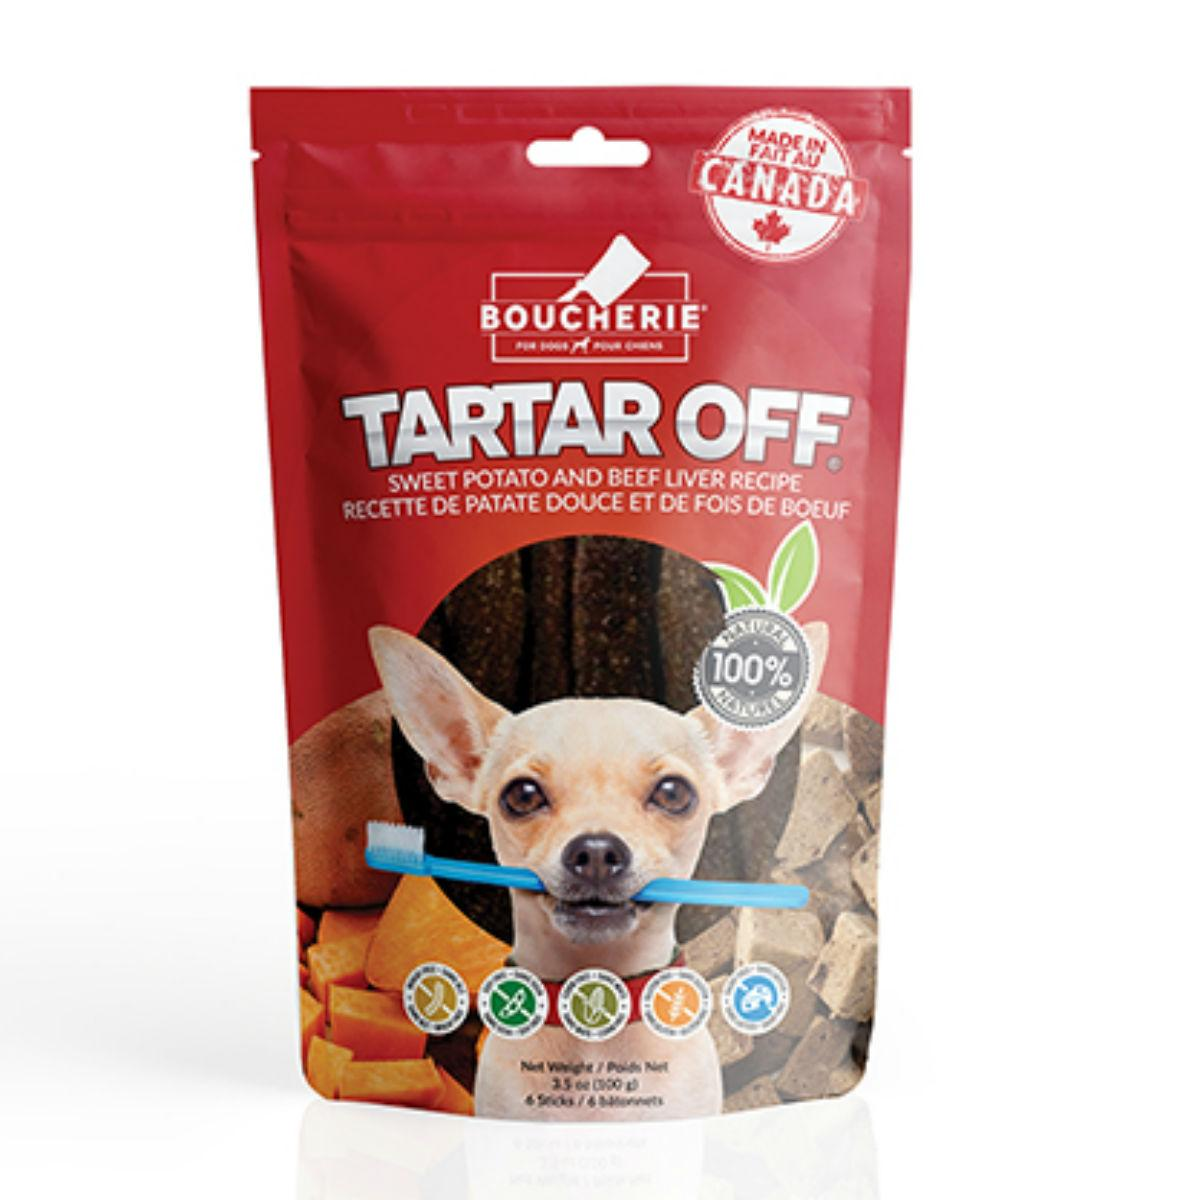 Boucherie Tartar Off Dog Treat - Sweet Potato with Beef Liver